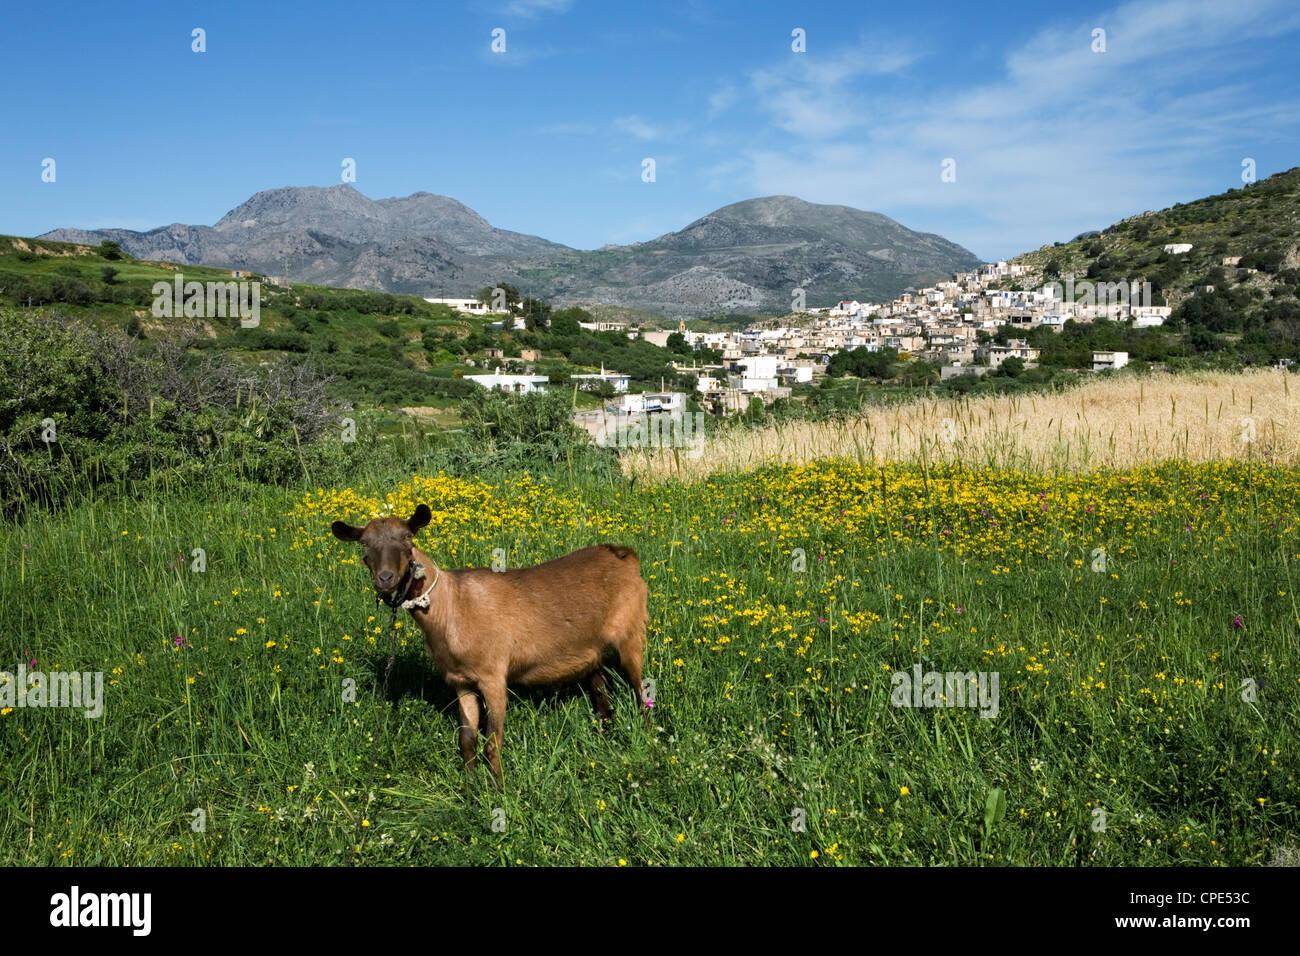 Goat in spring meadow, Agios Stefanos, near Pefki, Lasithi region, Crete, Greek Islands, Greece, Europe - Stock Image